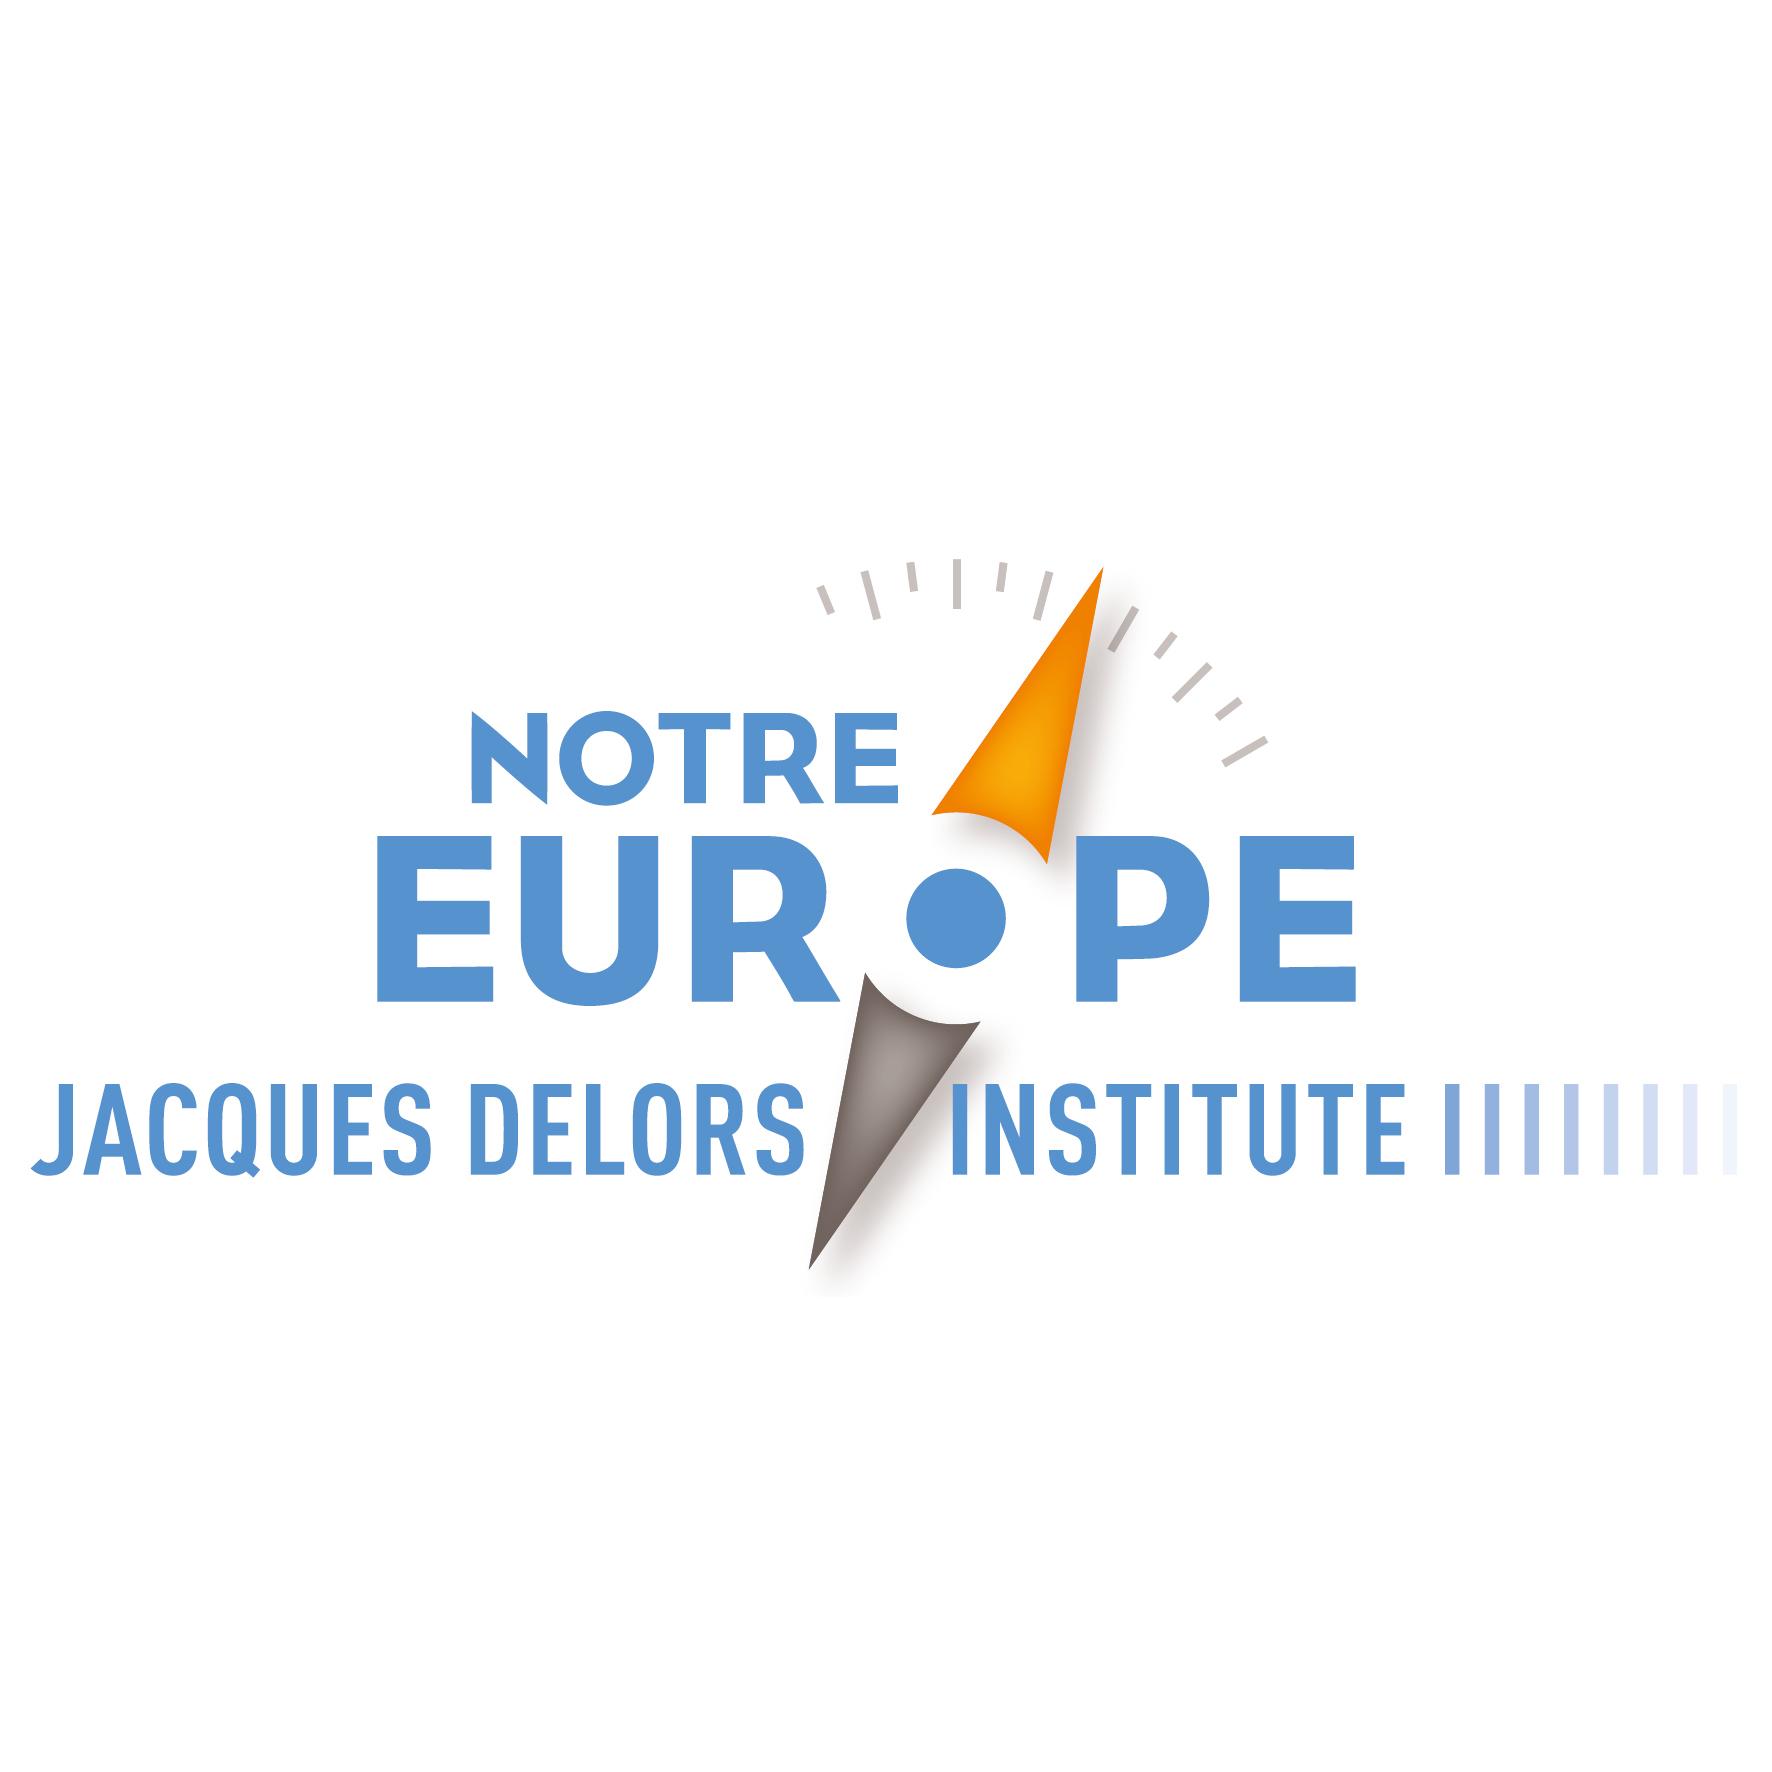 Jacques Delors Institute